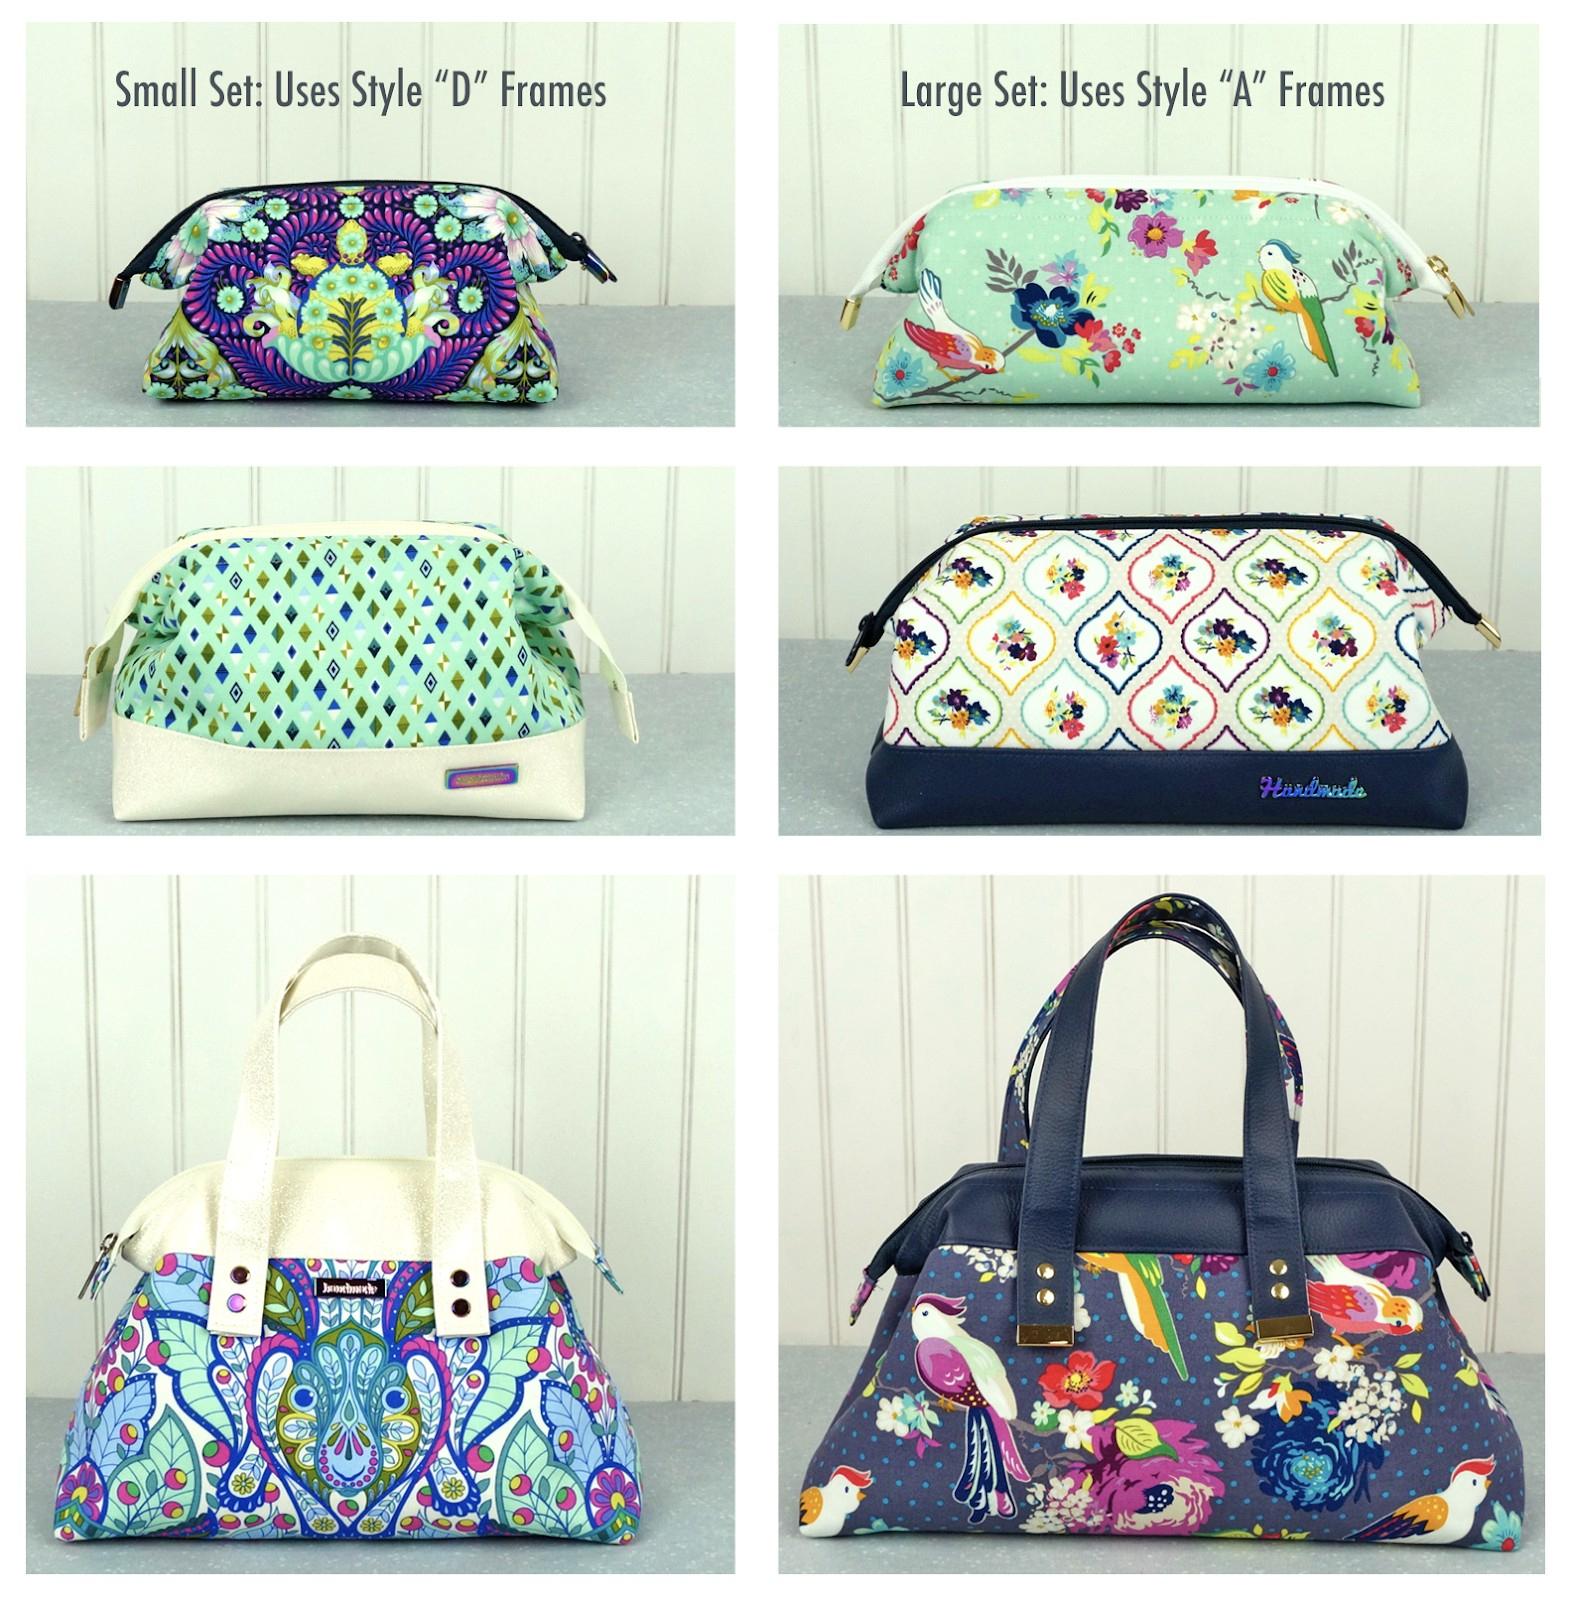 Handbag Patterns Free Printable New Emmaline Bags Sewing Patterns - Handbag Patterns Free Printable